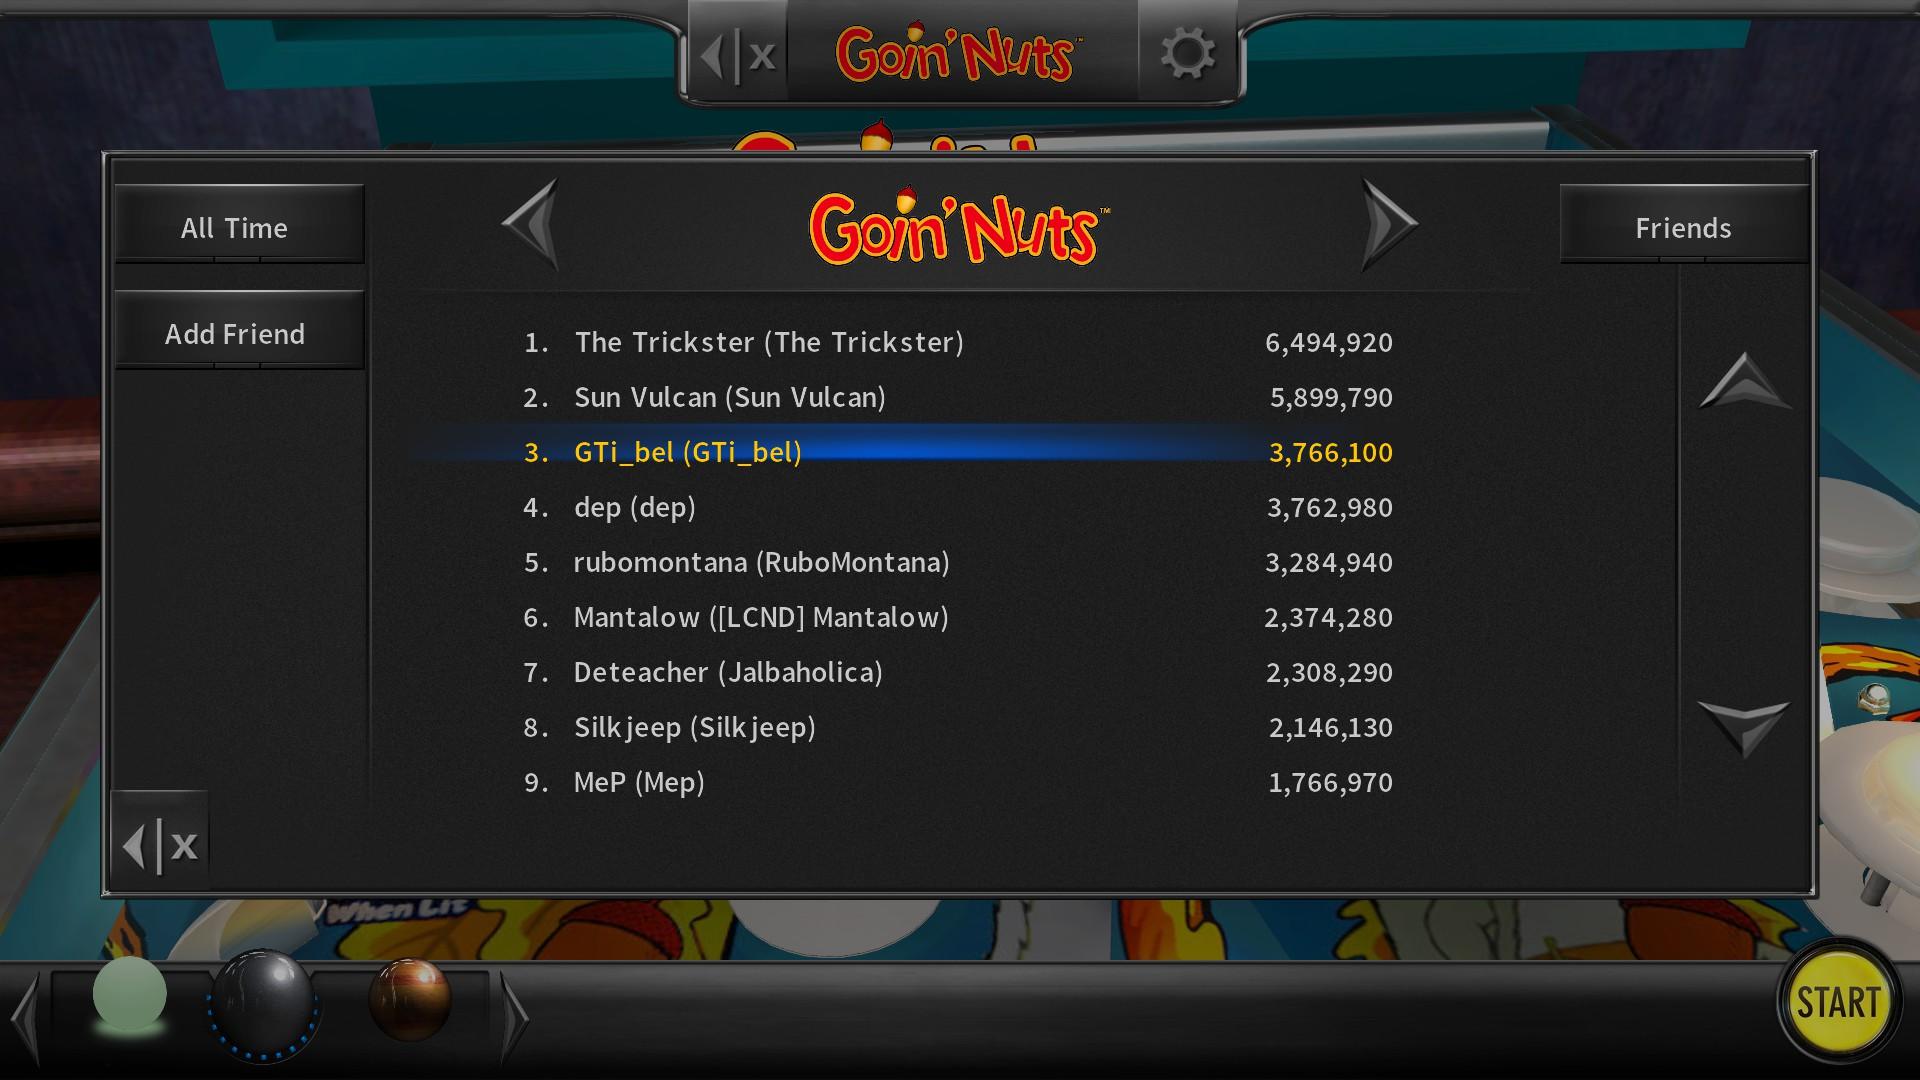 GTibel: Pinball Arcade: Goin